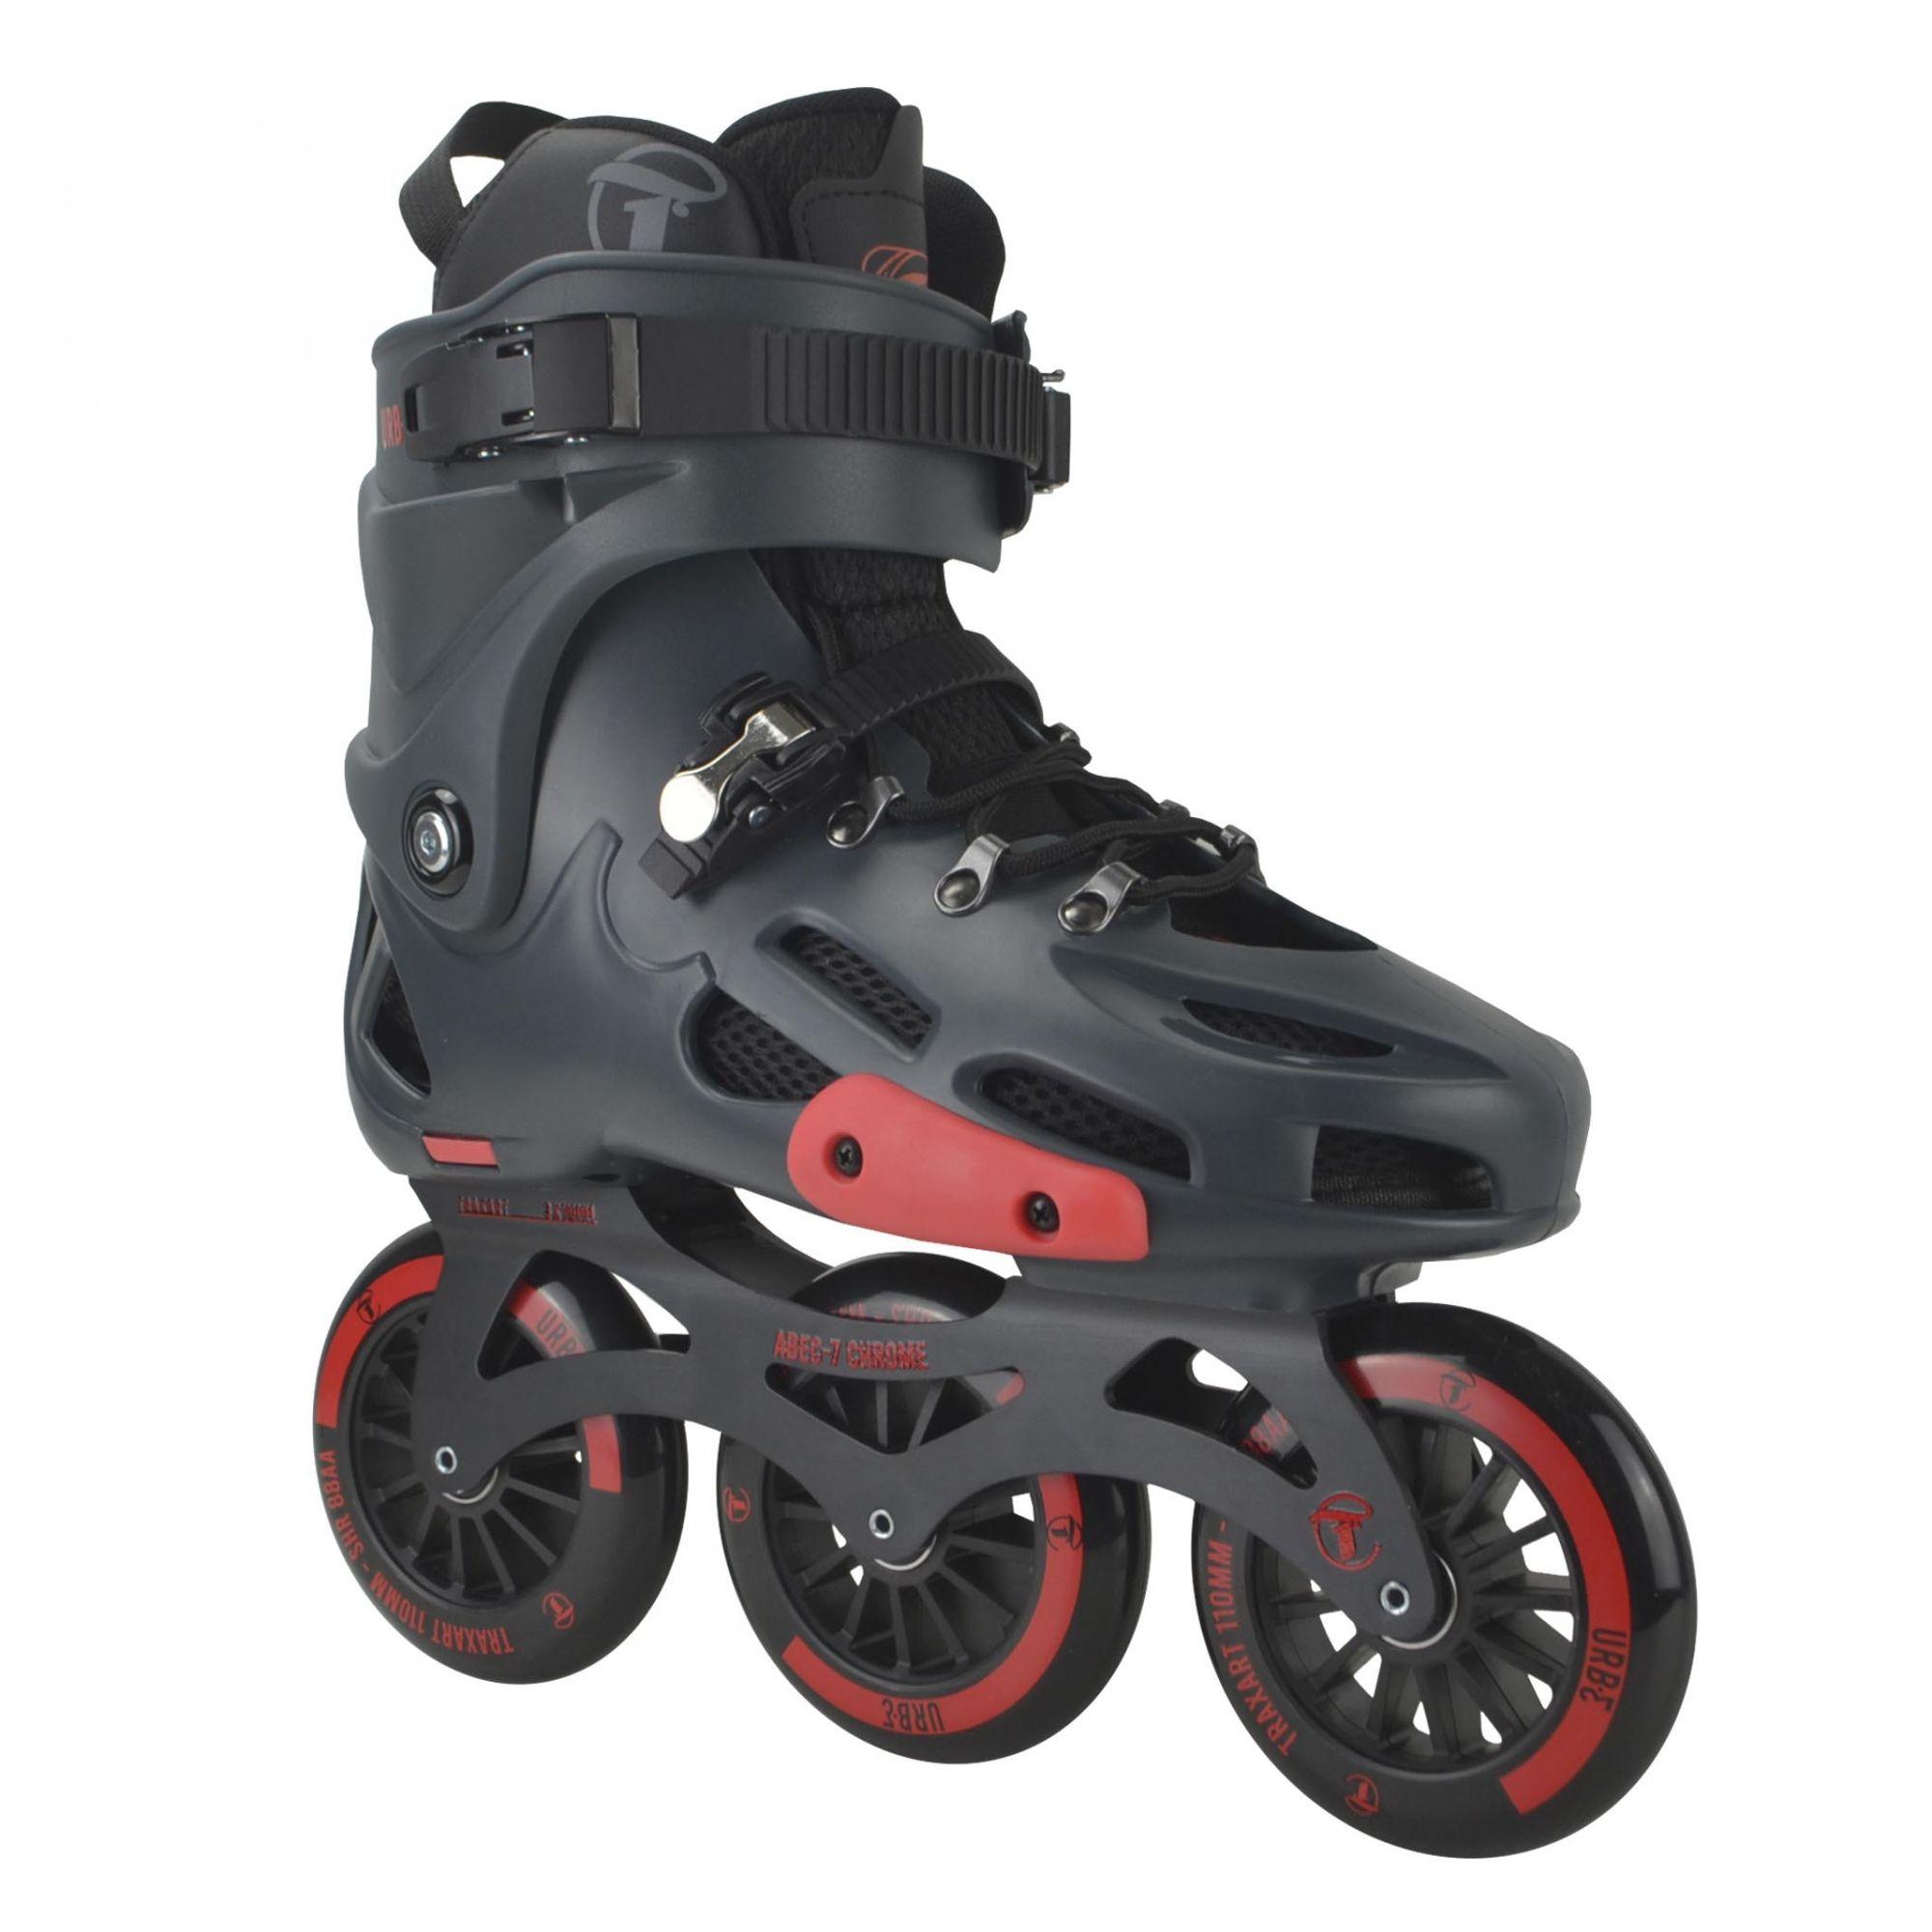 Patins Traxart Freestyle Urban URB-E - Rodas 110mm ABEC-7 Cromo